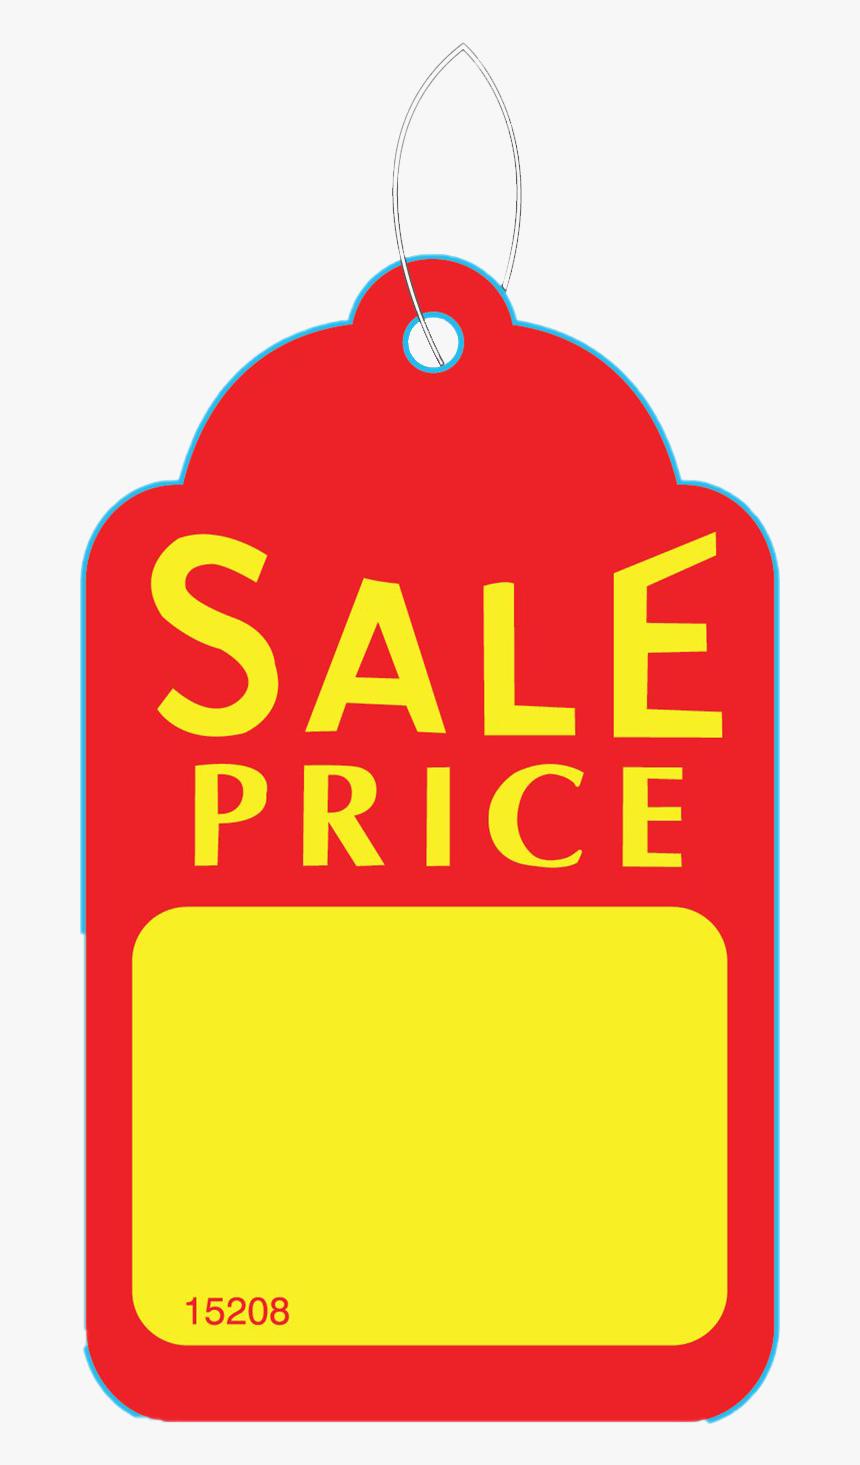 Blank Price Tag Png Sexy Price Tag Png Transparent Png Download Transparent Png Image Pngitem